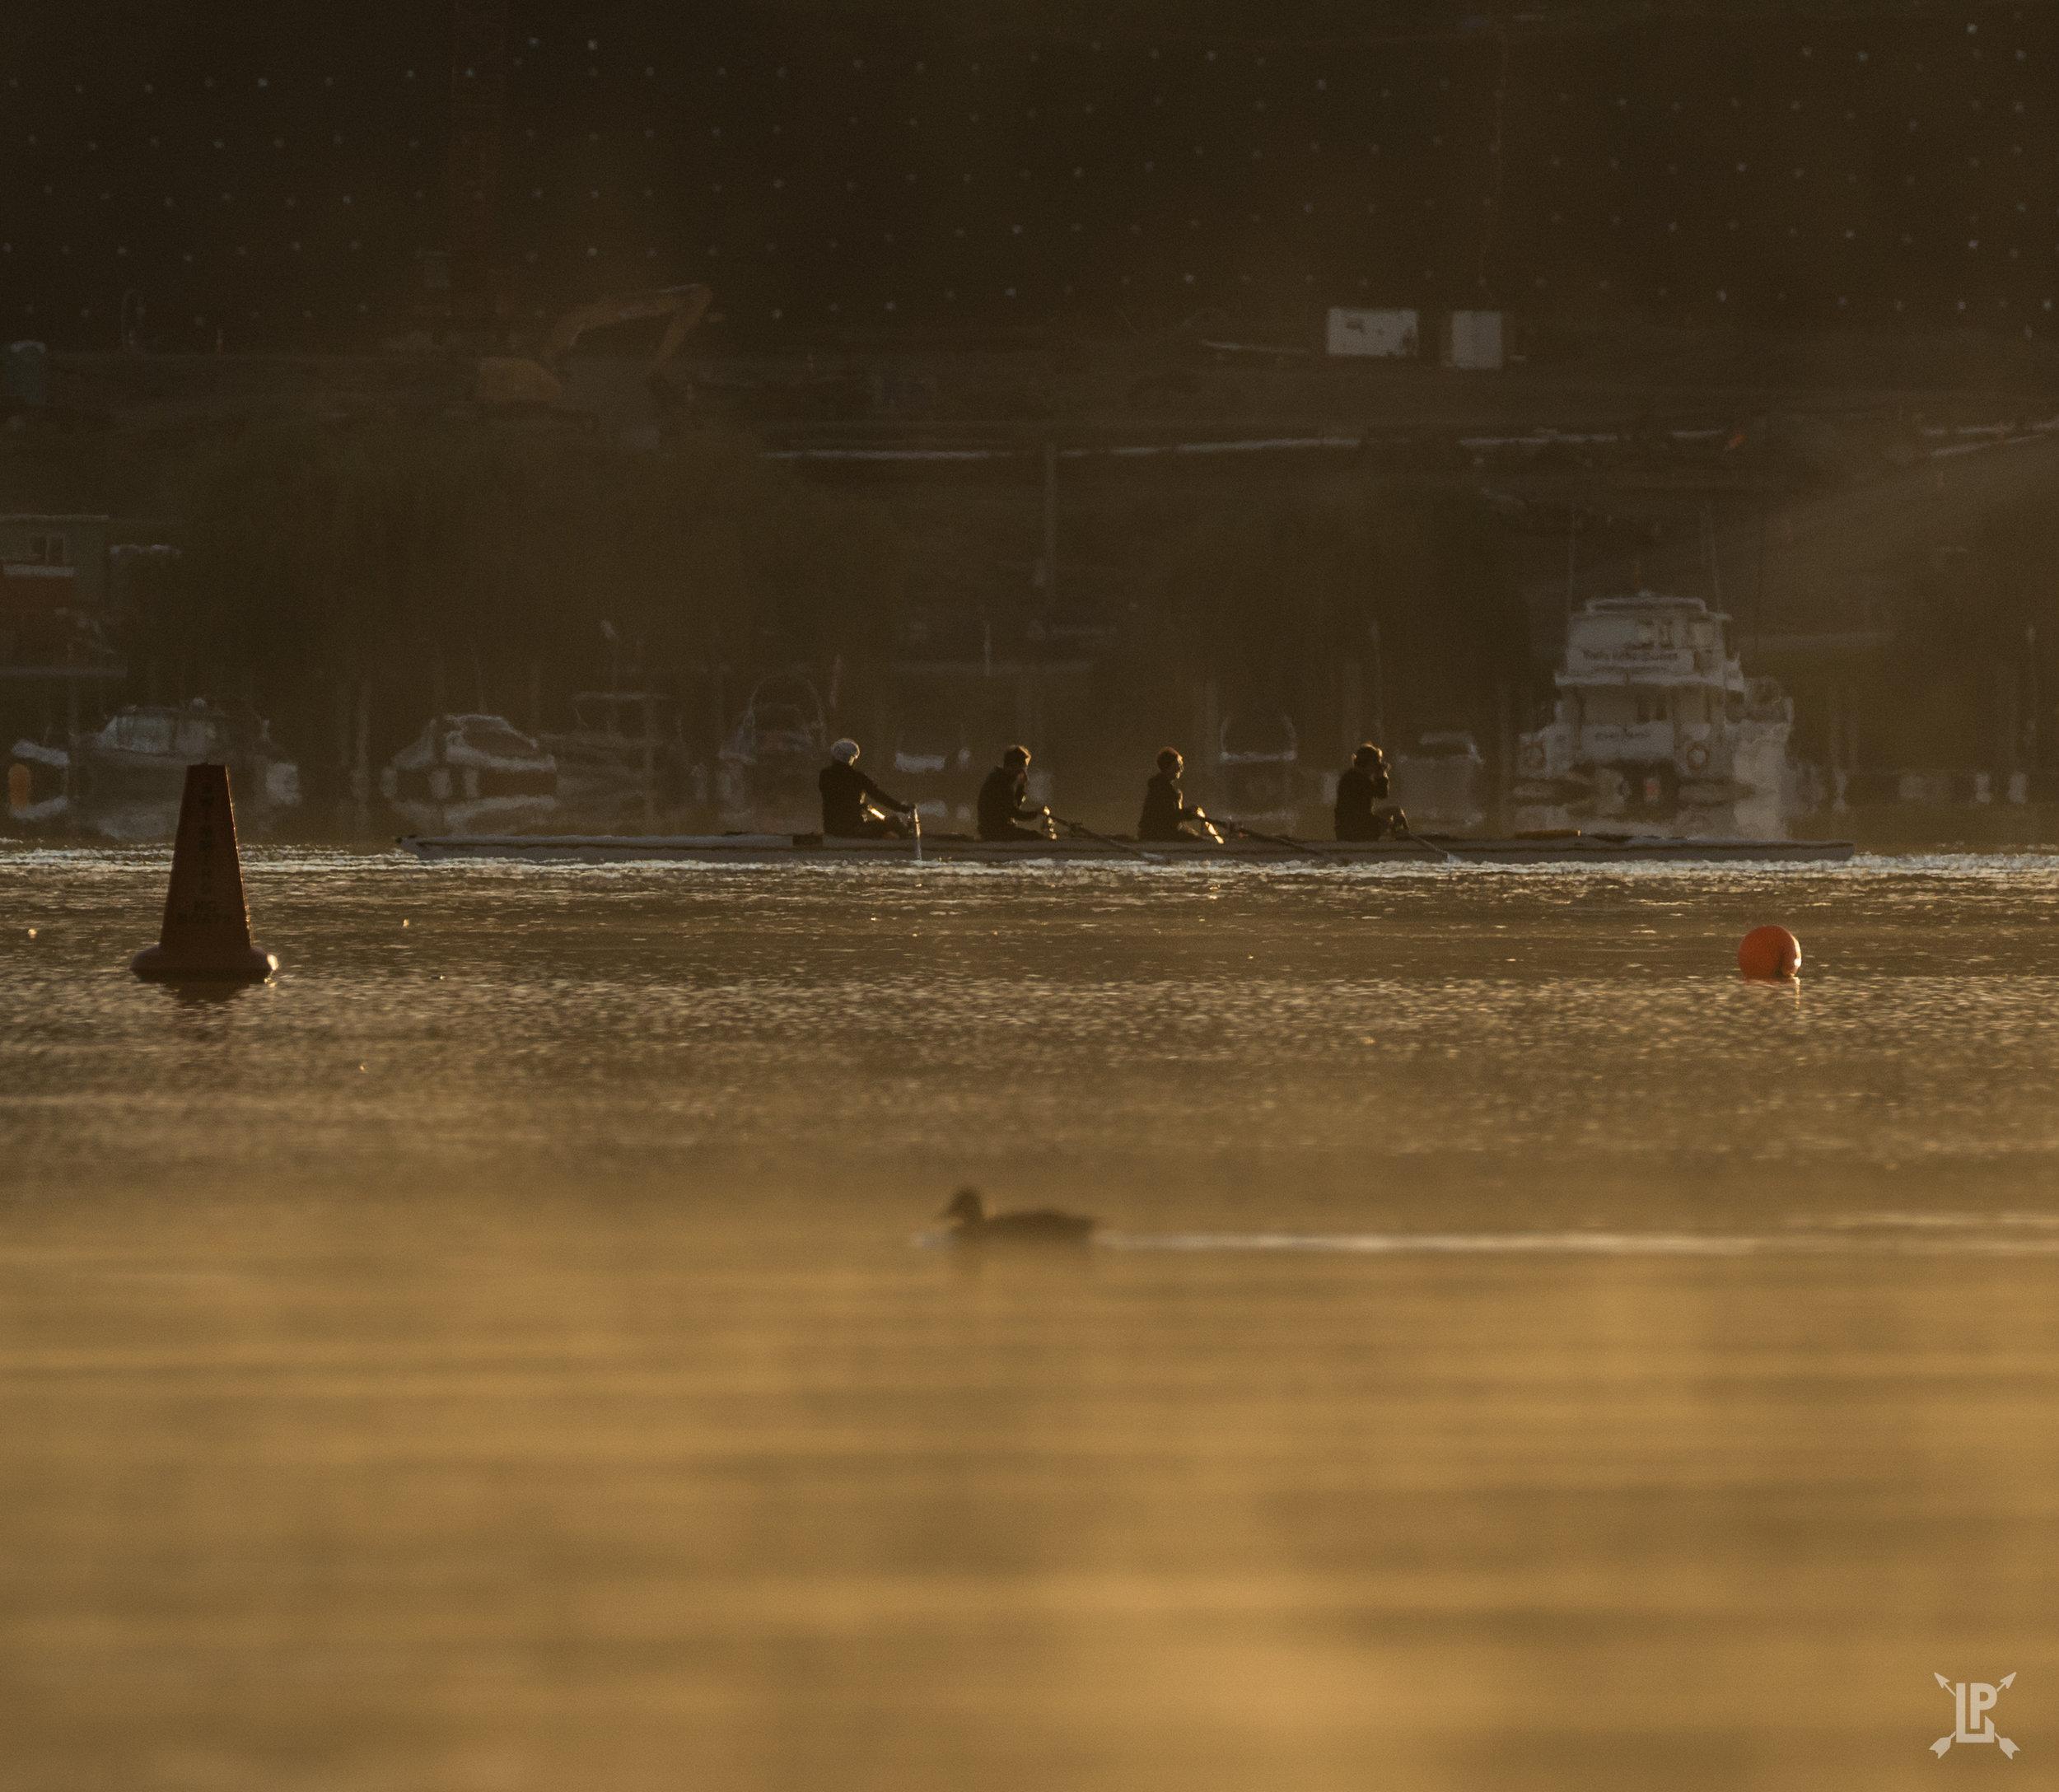 Boat crew racing a duck